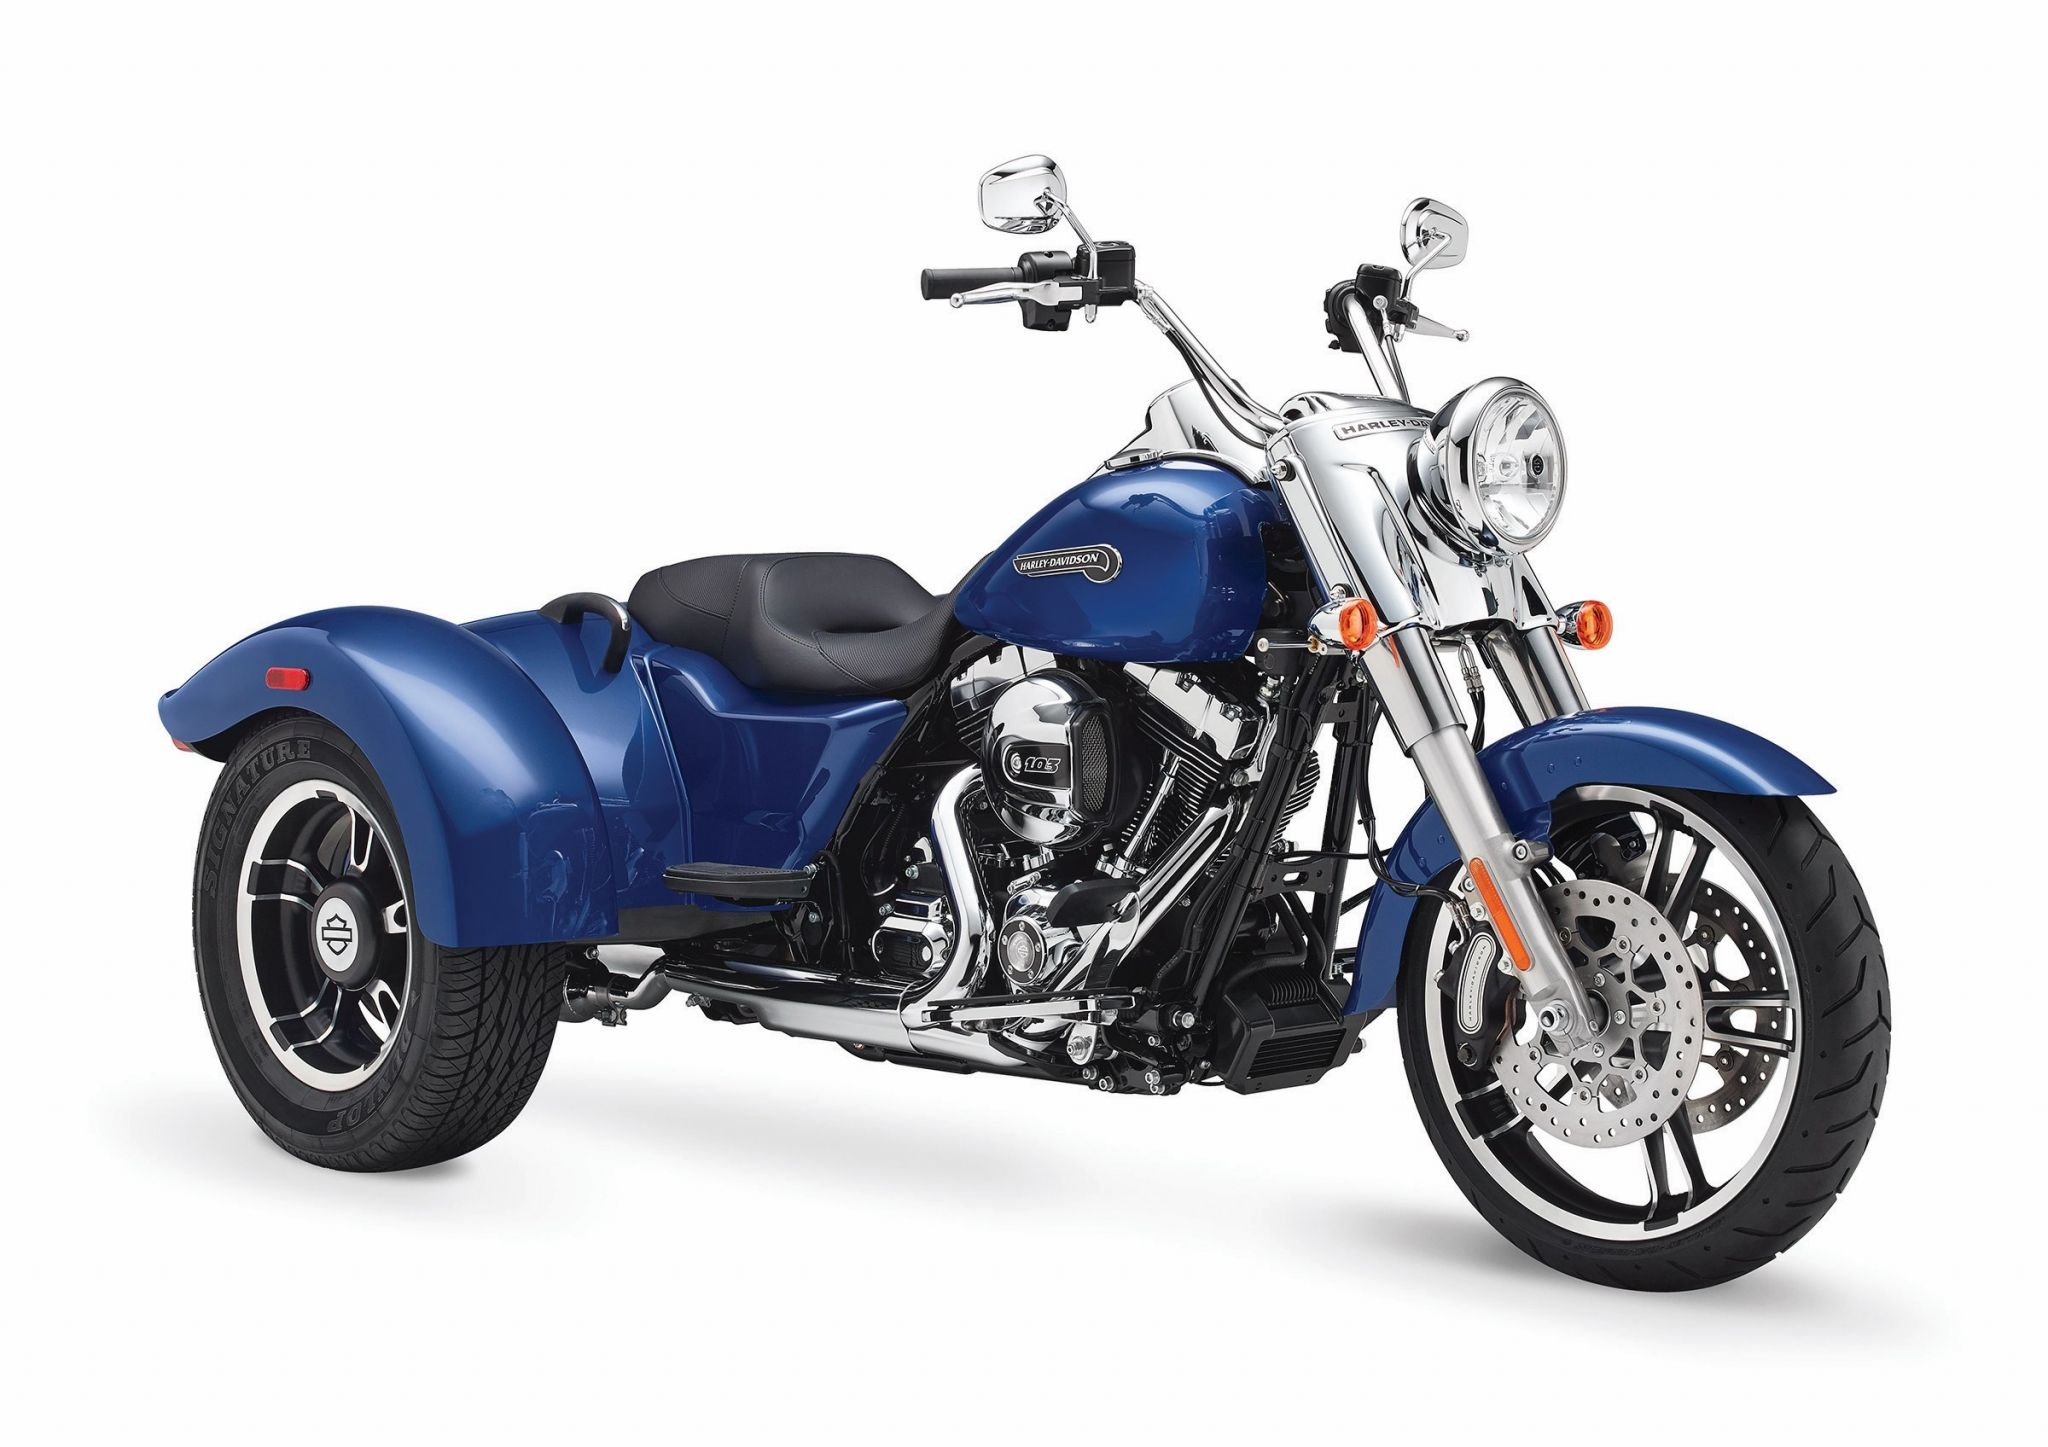 Harley Davidson Free Wallpaper Screensavers Ololoshenka Motorcycles